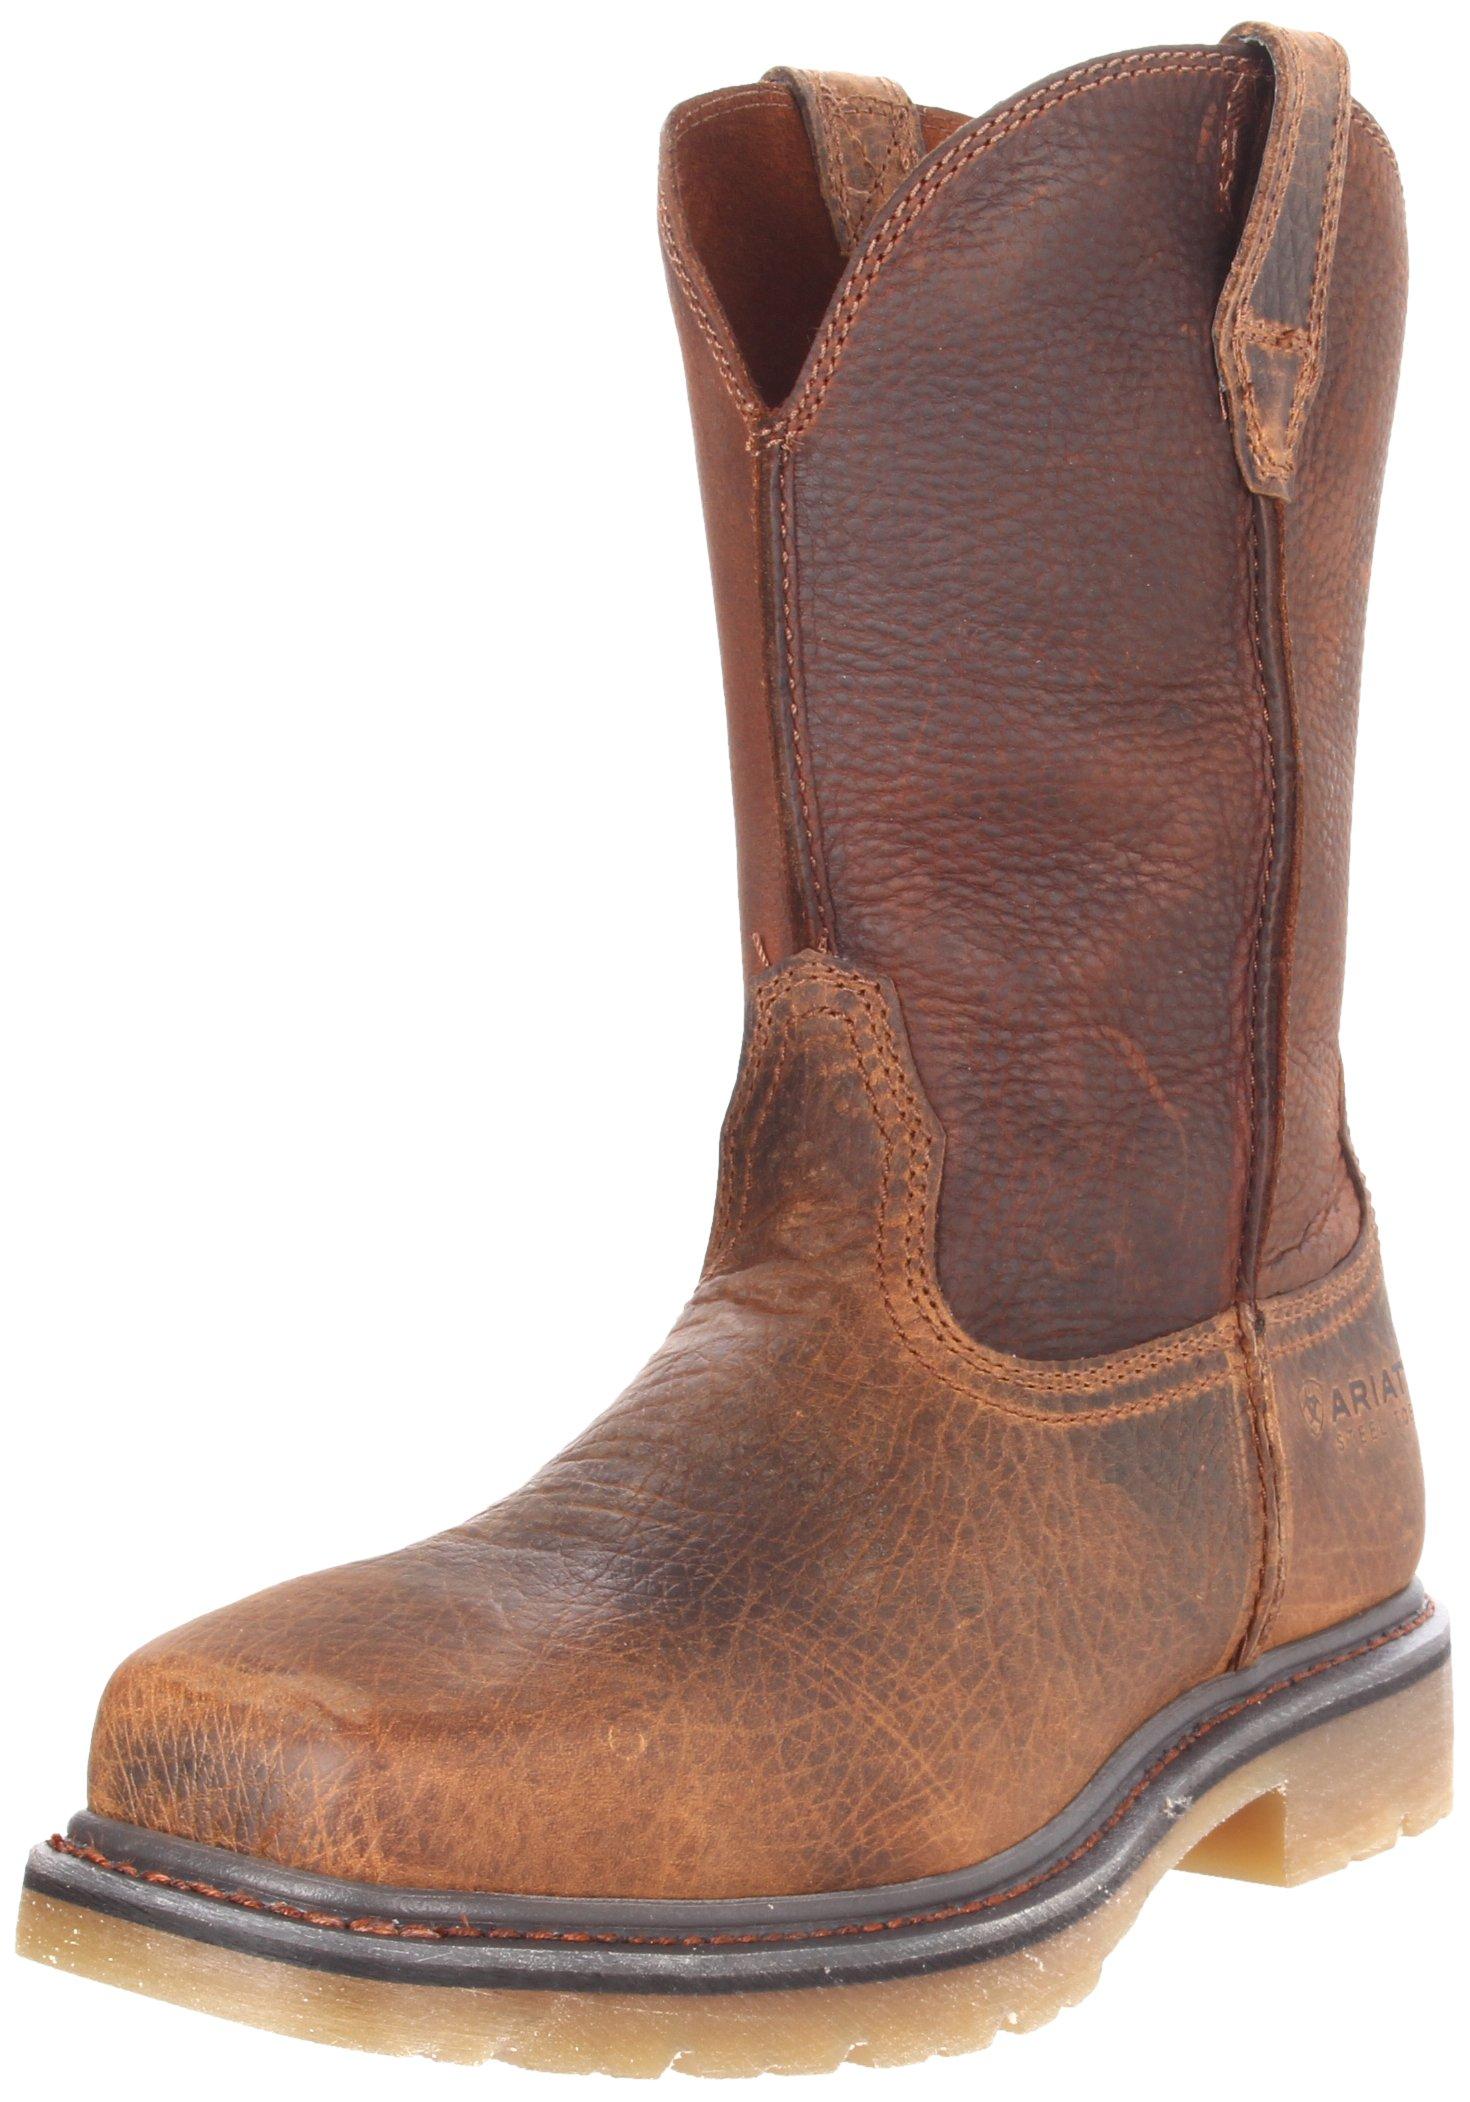 Ariat Men's Rambler Pull-on Steel Toe Work Boot, Earth/Brown, 12 2E US